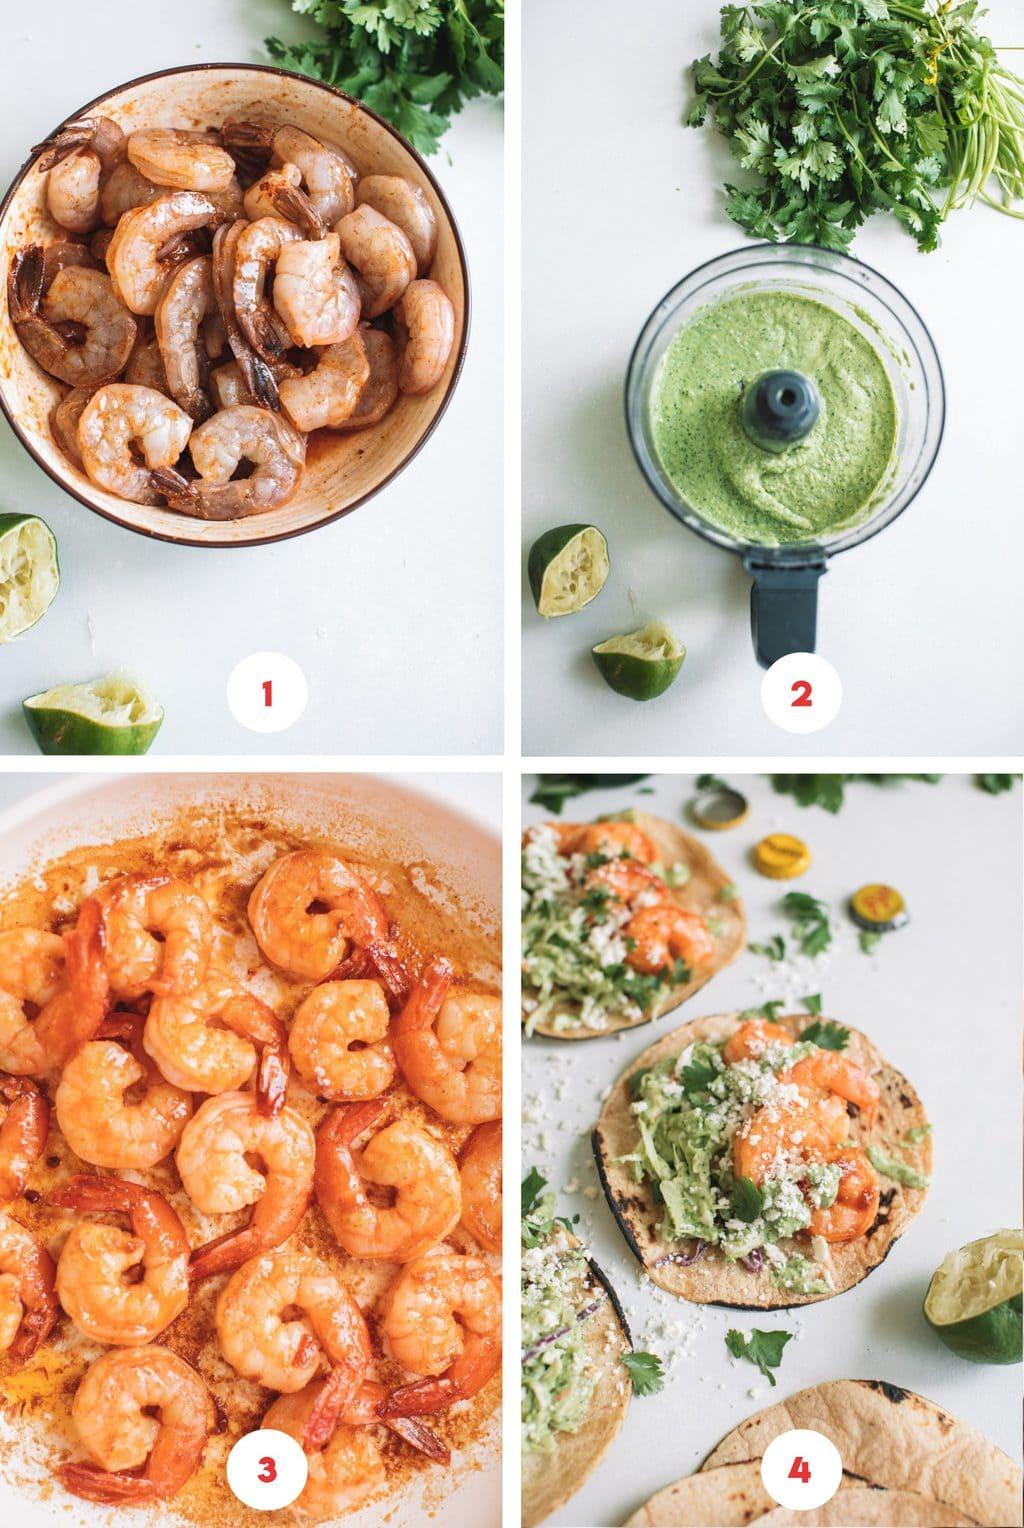 marinating shrimp in bowl, avocado crema in food processor, cooking shrimp in skillet, spicy shrimp tacos with cilantro lime slaw